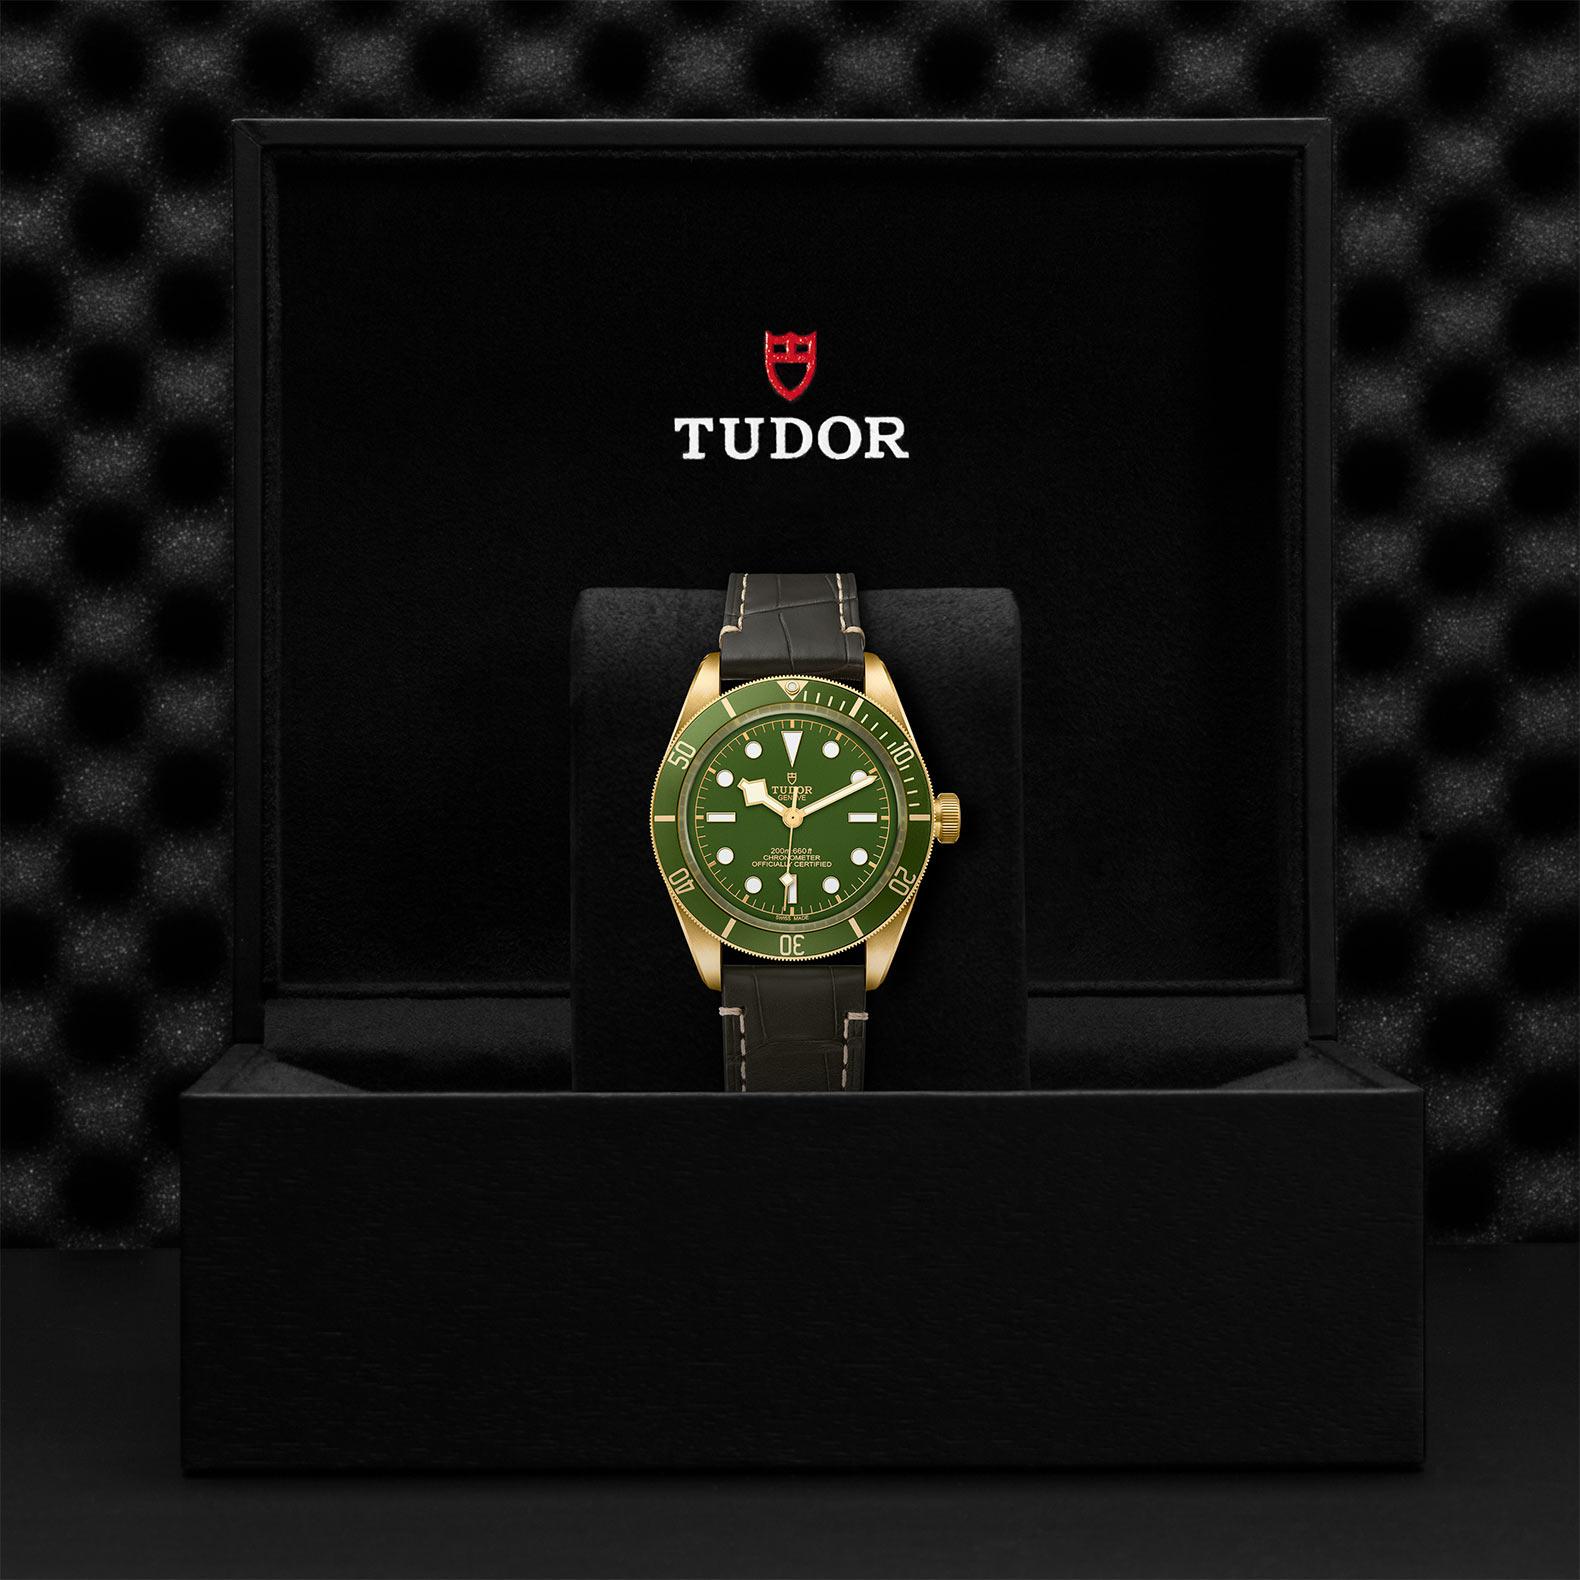 TUDOR Black Bay Fifty-Eight 18k - M79018V-0001